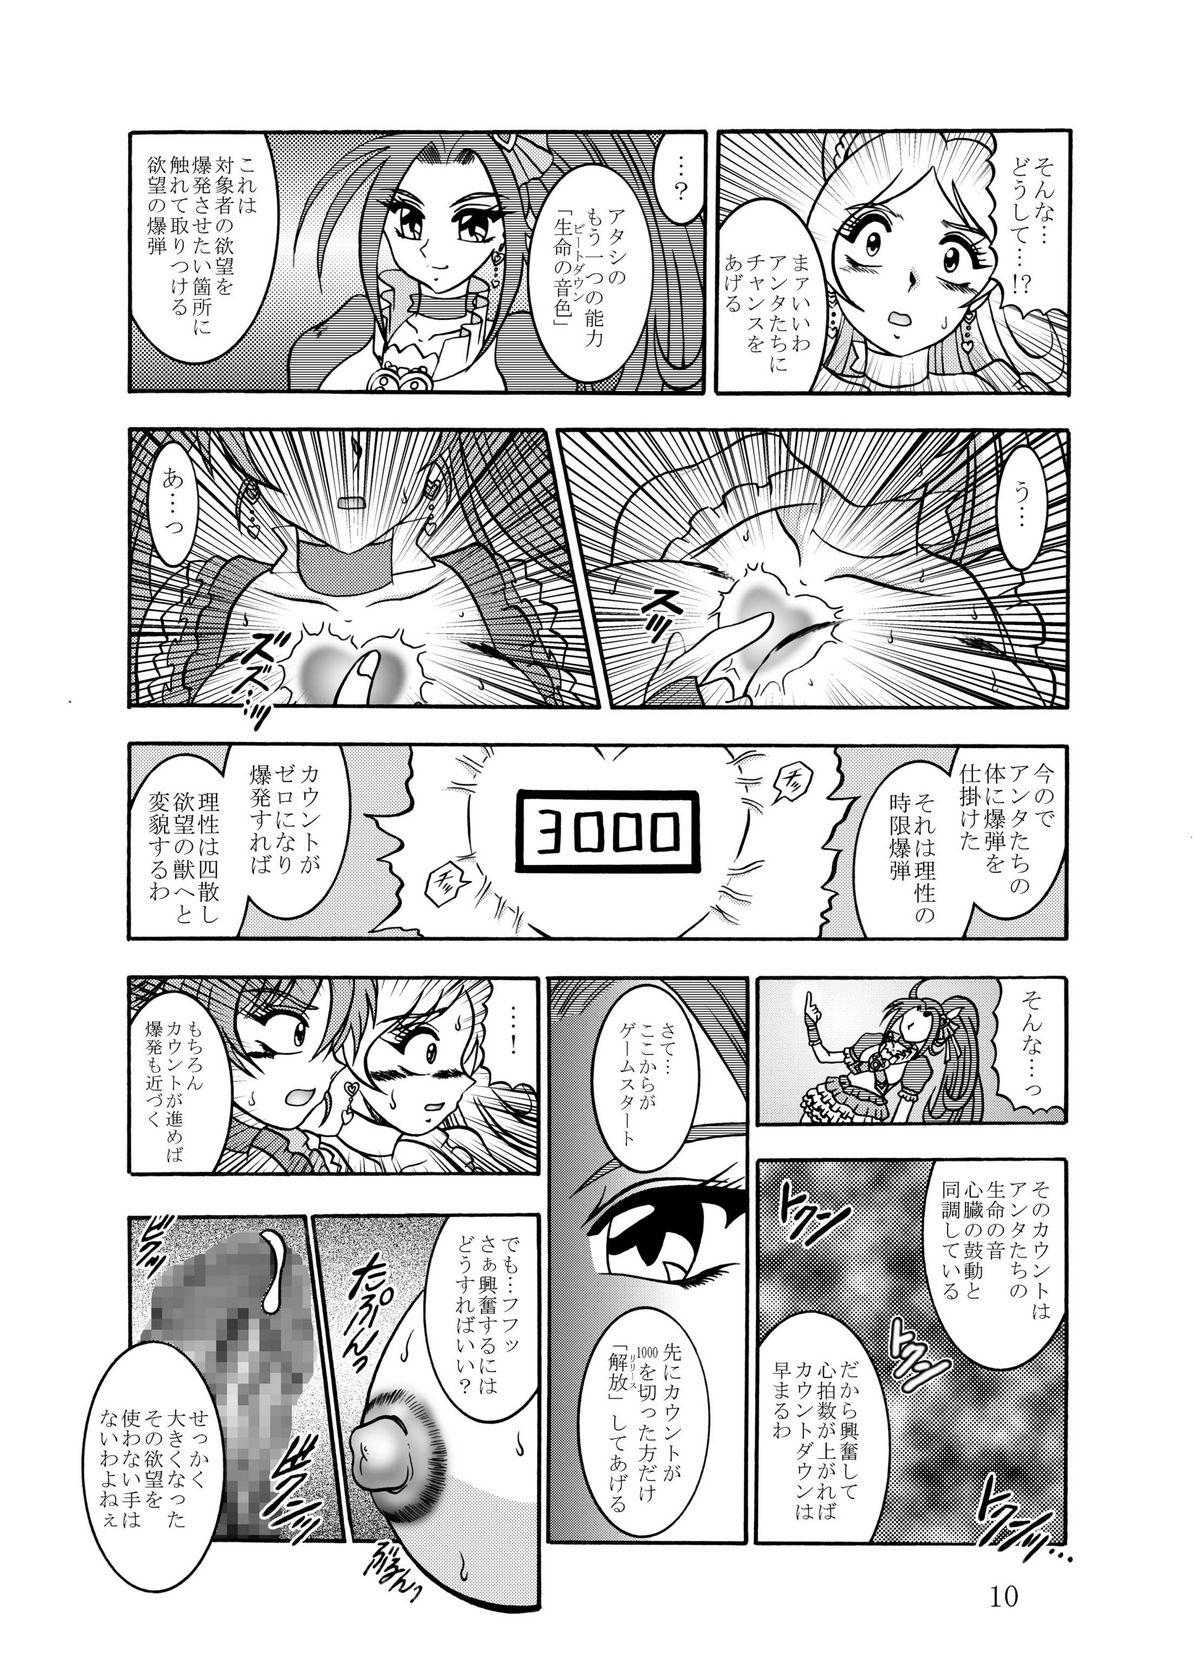 GREATEST ECLIPSE CrazyRHYTHM - Tsuya sou 8